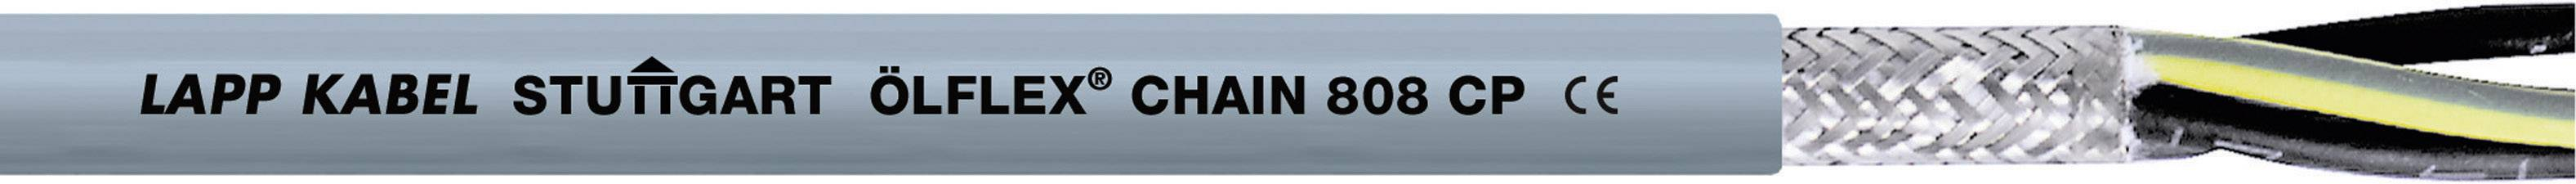 Žíla kabelu LappKabel ÖLFLEX CHAIN 808 CP 12G1,0 (1027772), 12x 1 mm², polyurethan, Ø 11,7 mm, stíněný, 1 m, š